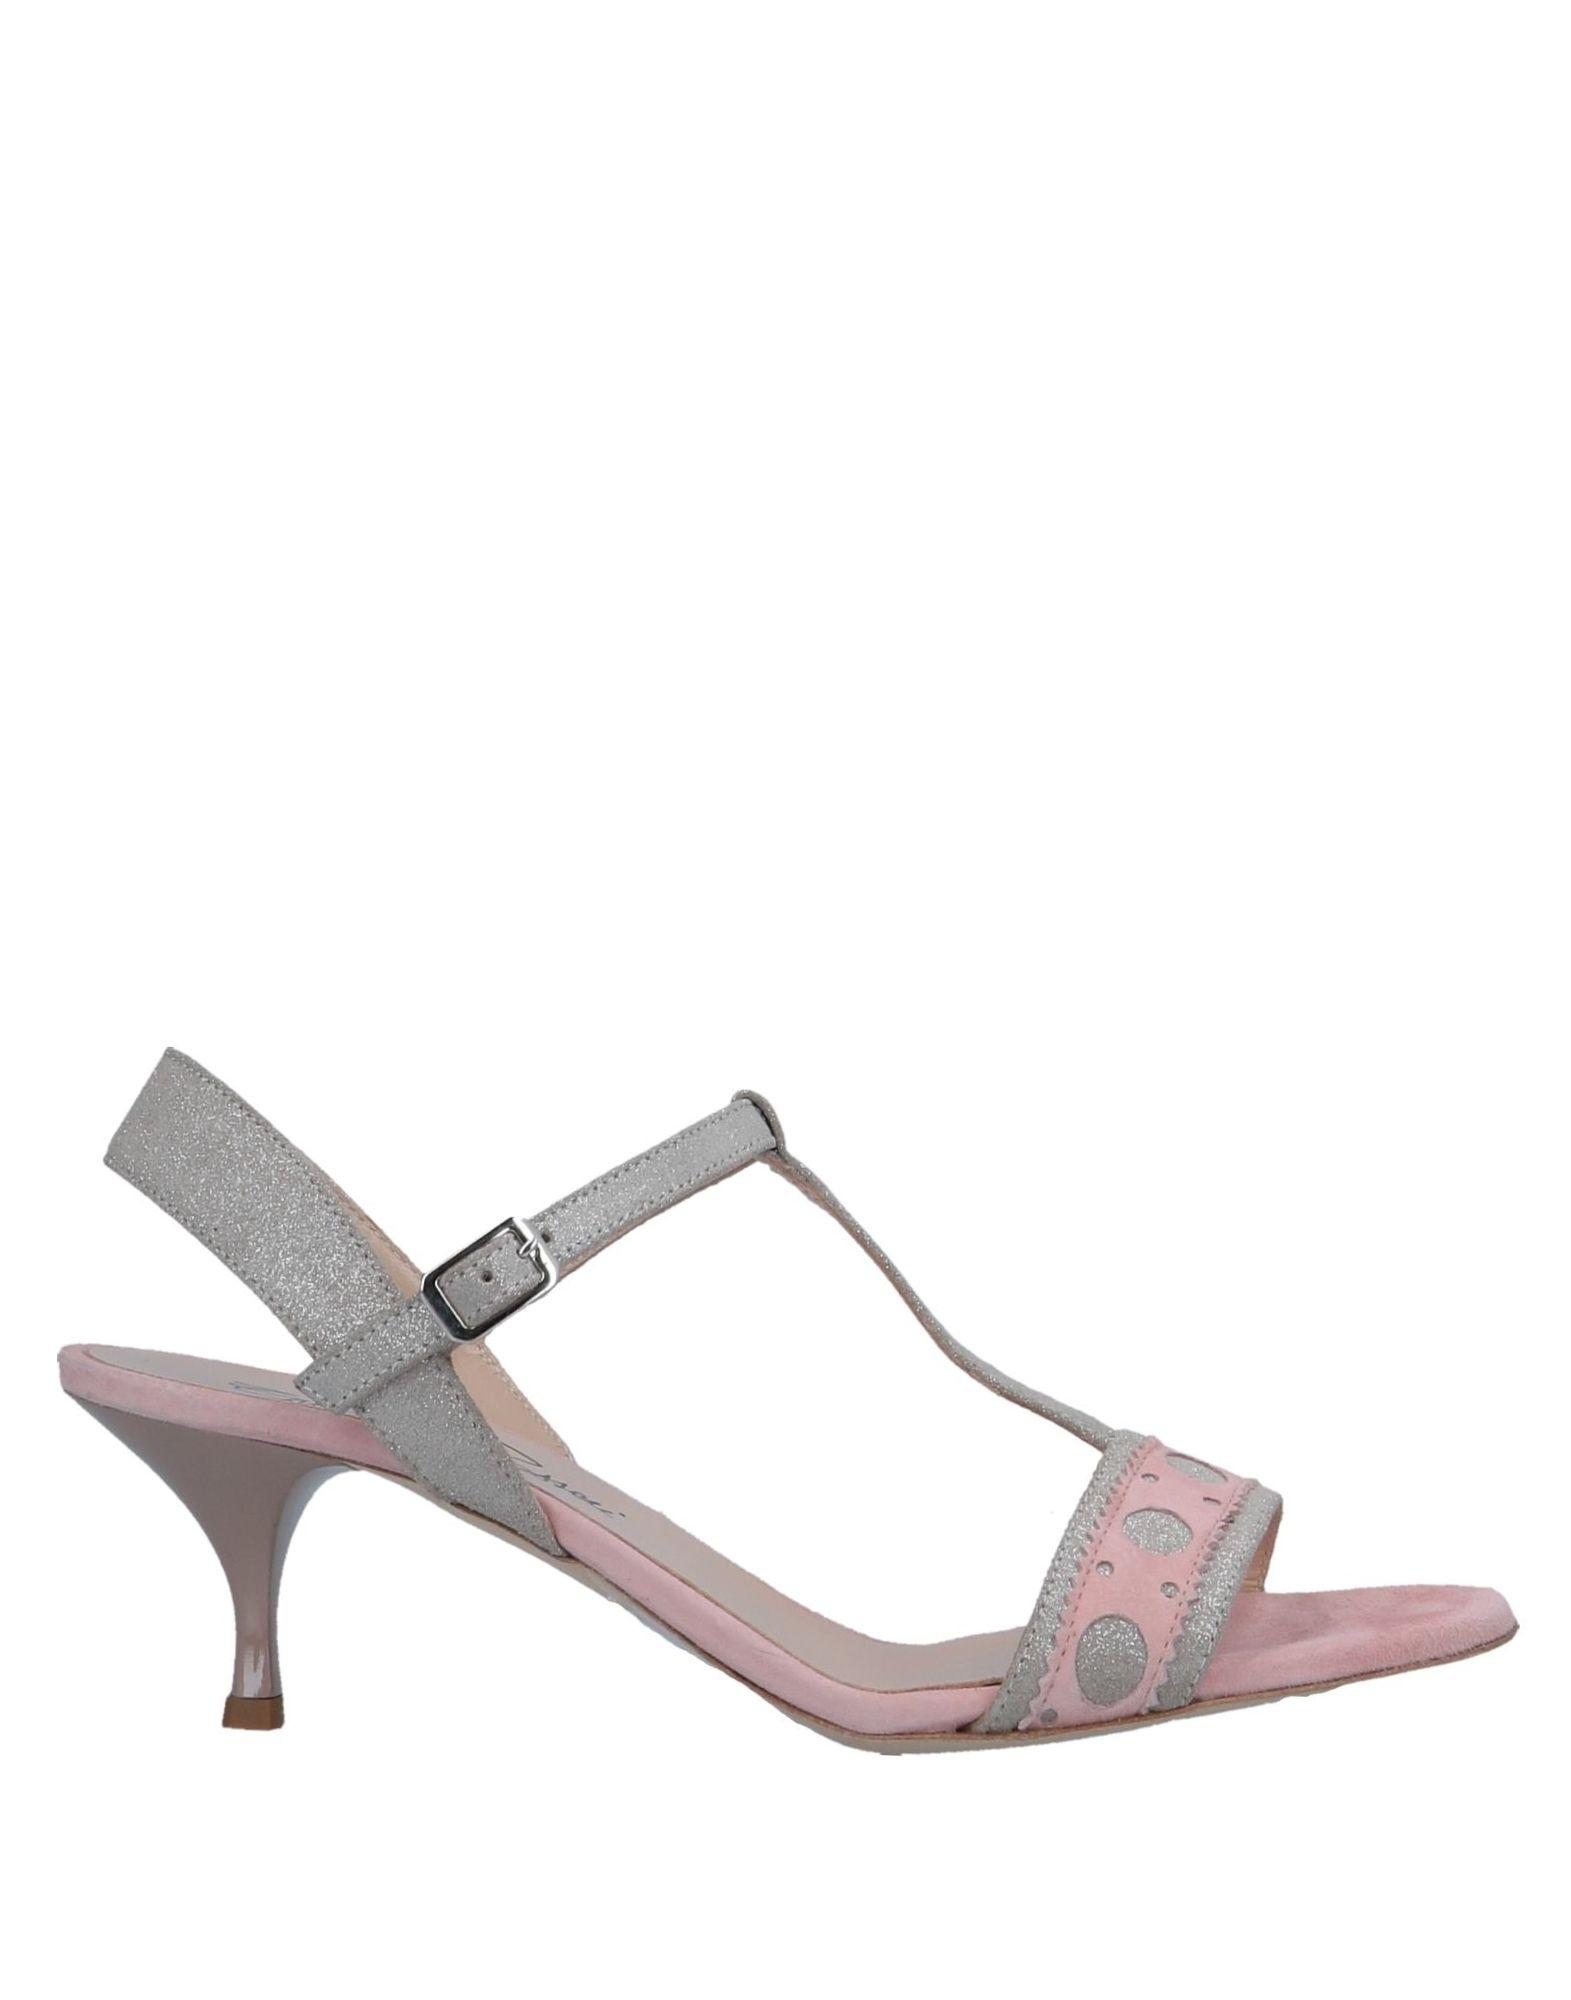 Stilvolle billige Schuhe Damen Emanuela Passeri Sandalen Damen Schuhe  11569251WD 32355f